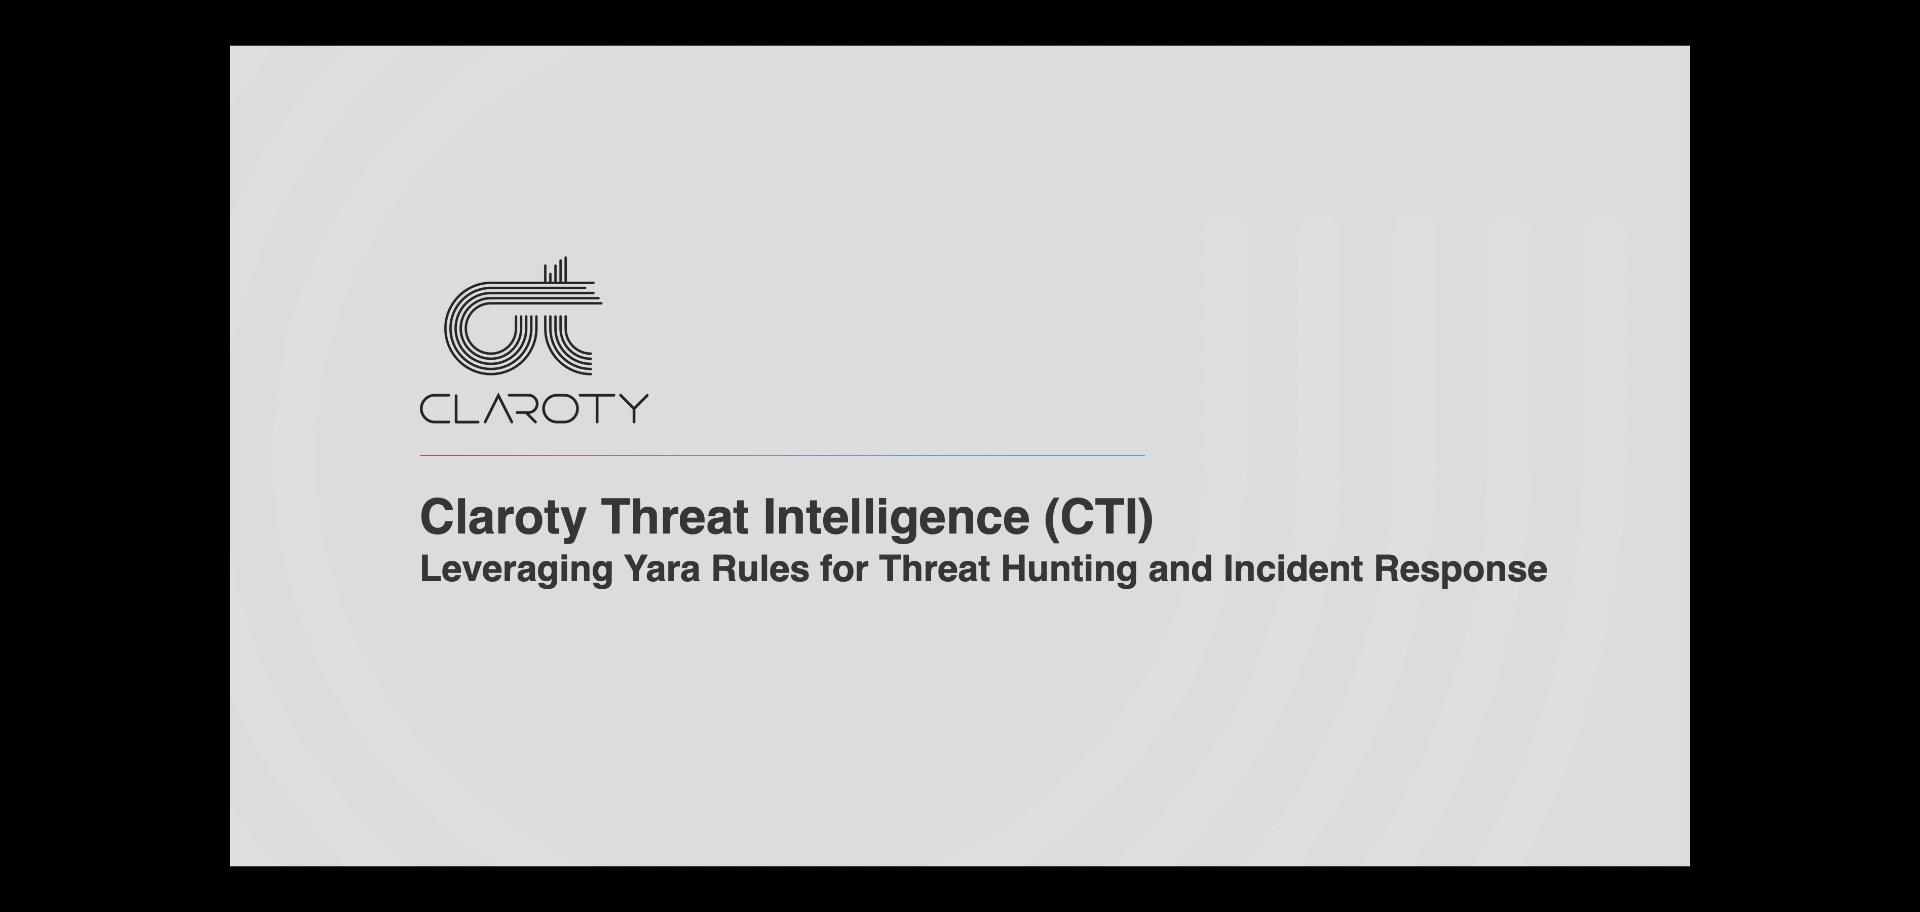 Claroty Threat Intelligence (CTI)